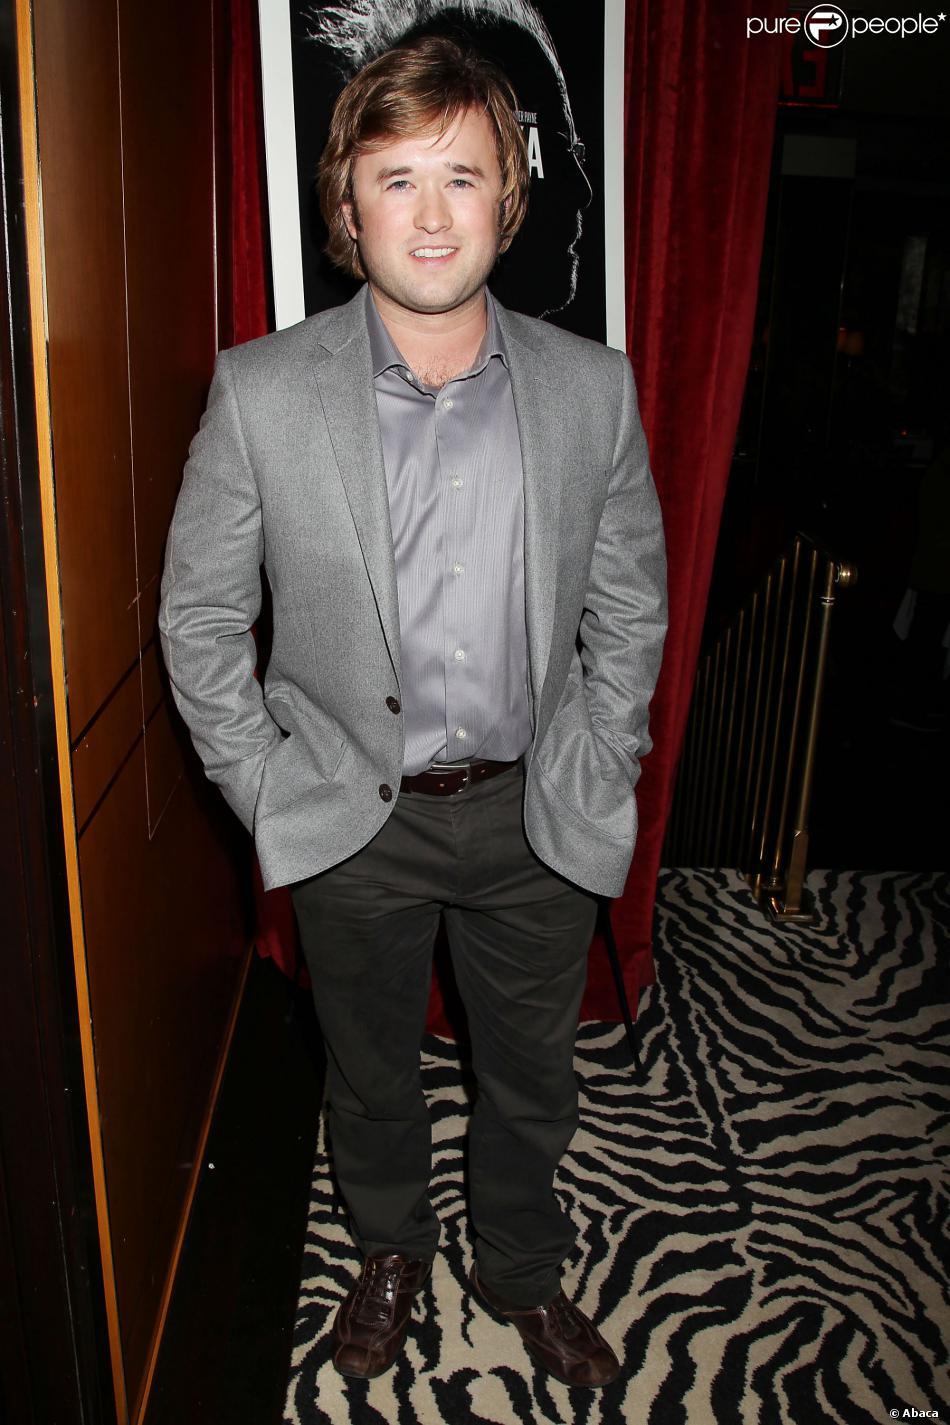 Haley Joel Osment, âgé de 25 ans, lors de l'after party du film Nebraska le 10 octobre 2013 à New York